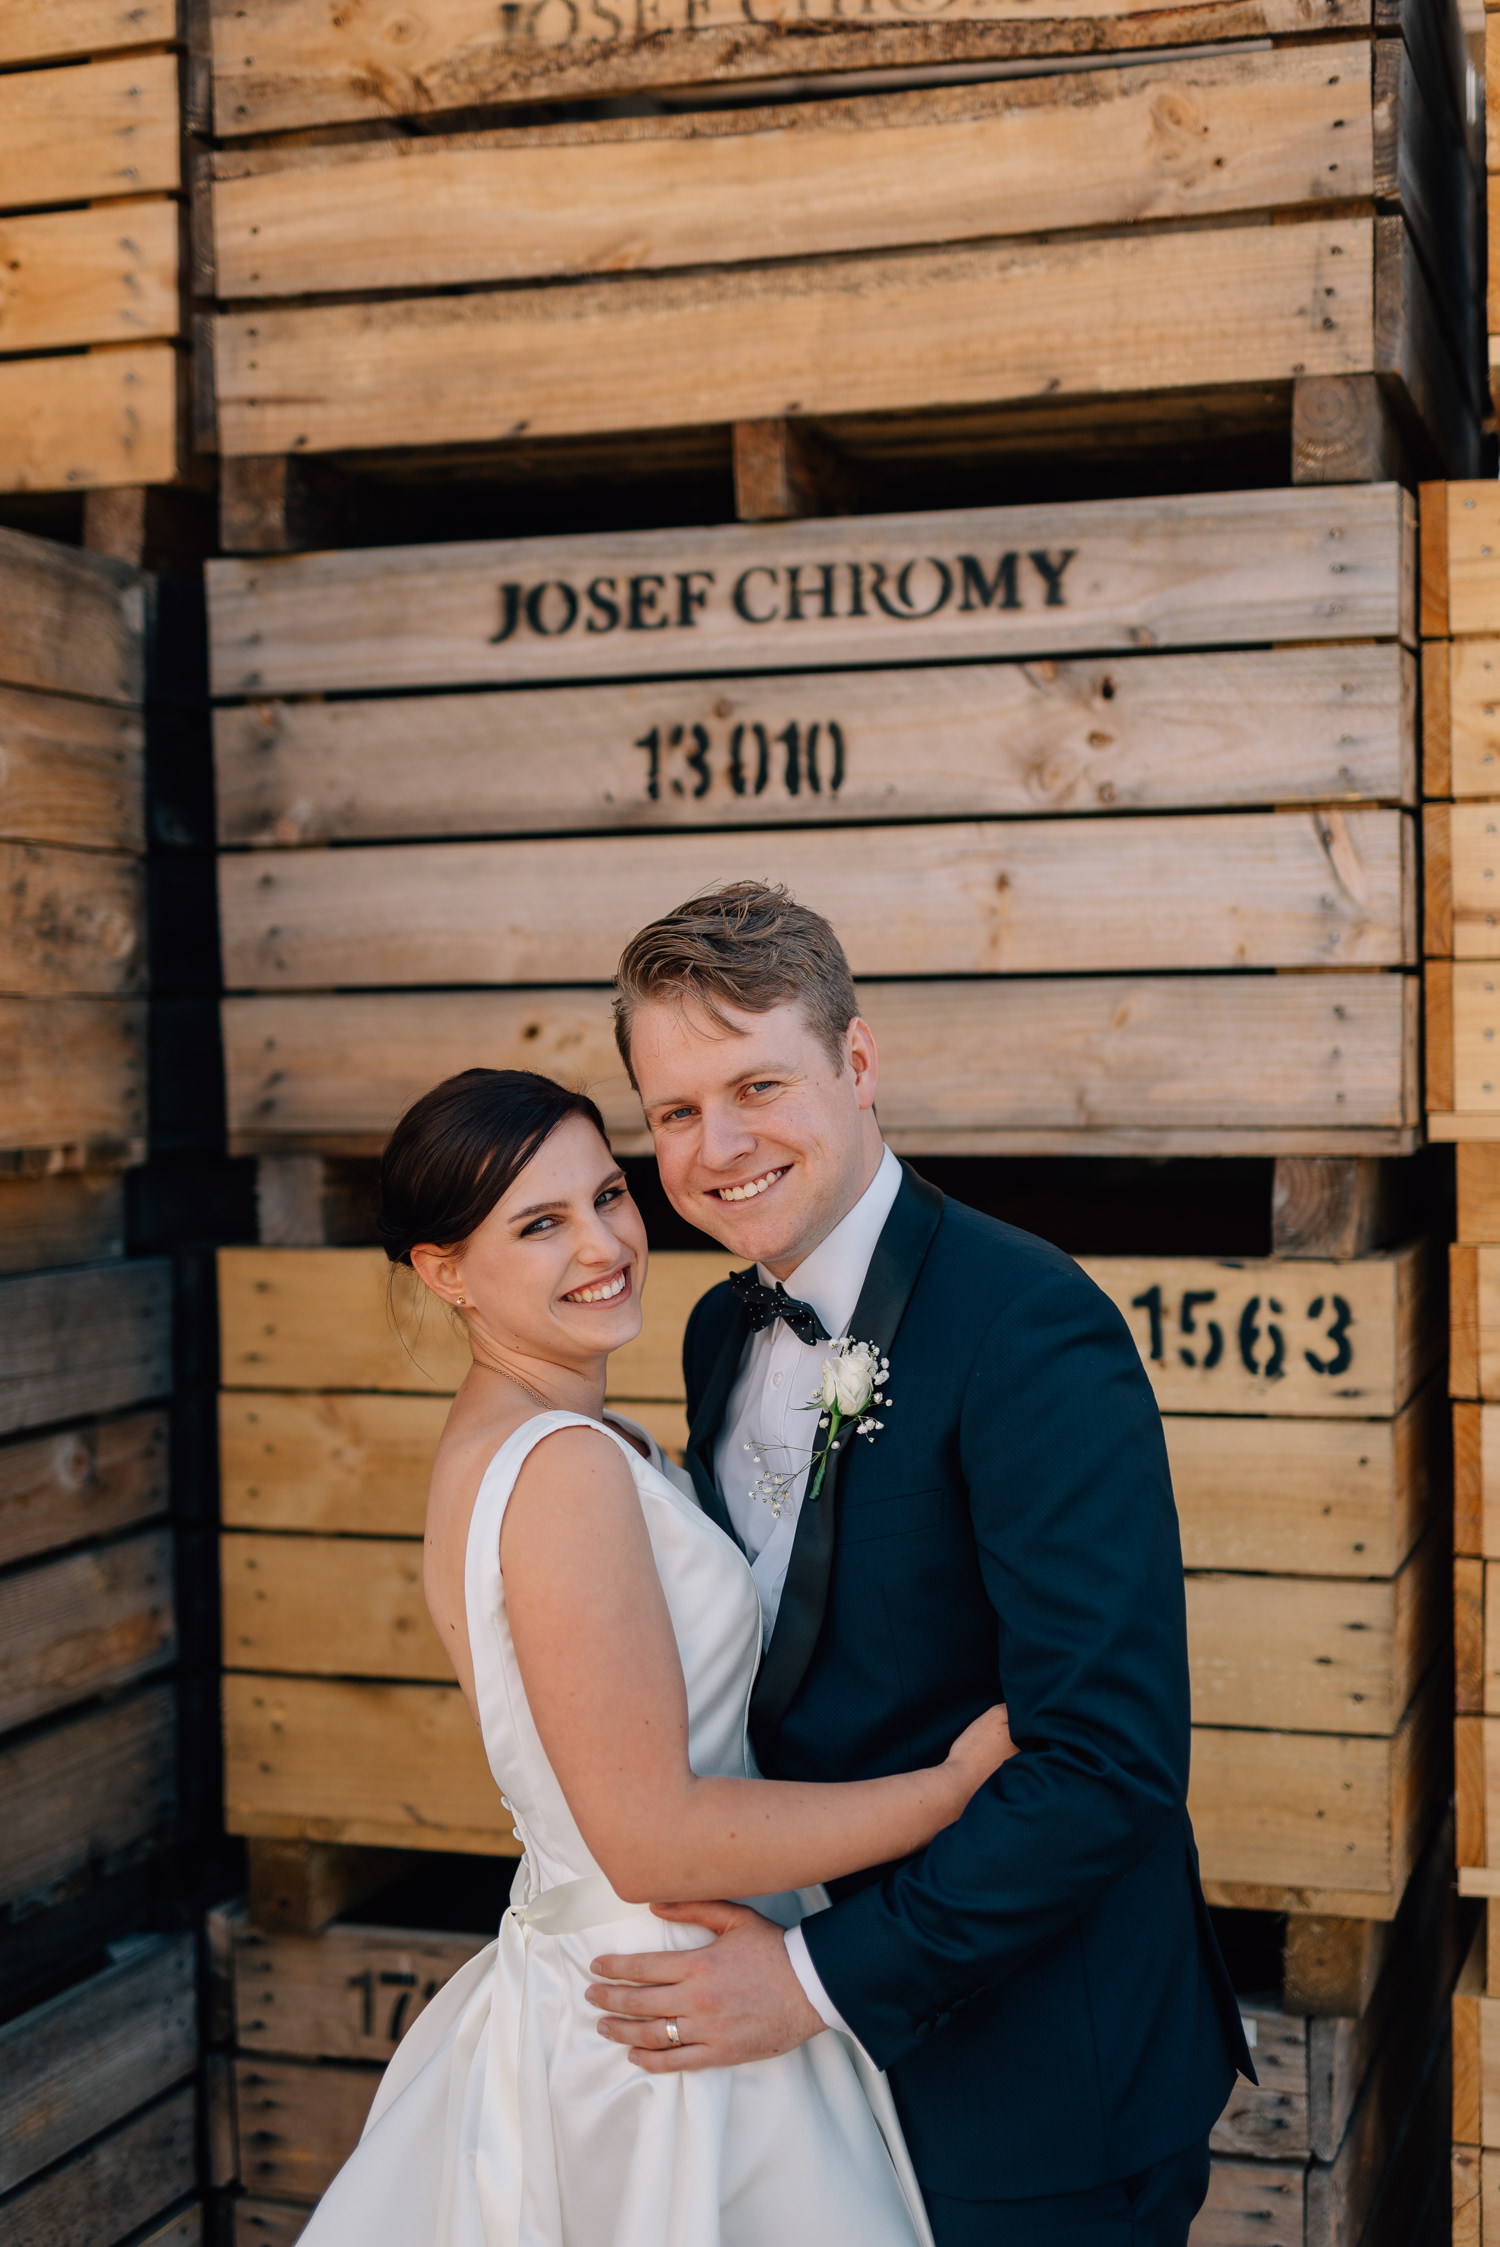 Josef-Chromy-Wedding-Photographer-61.jpg